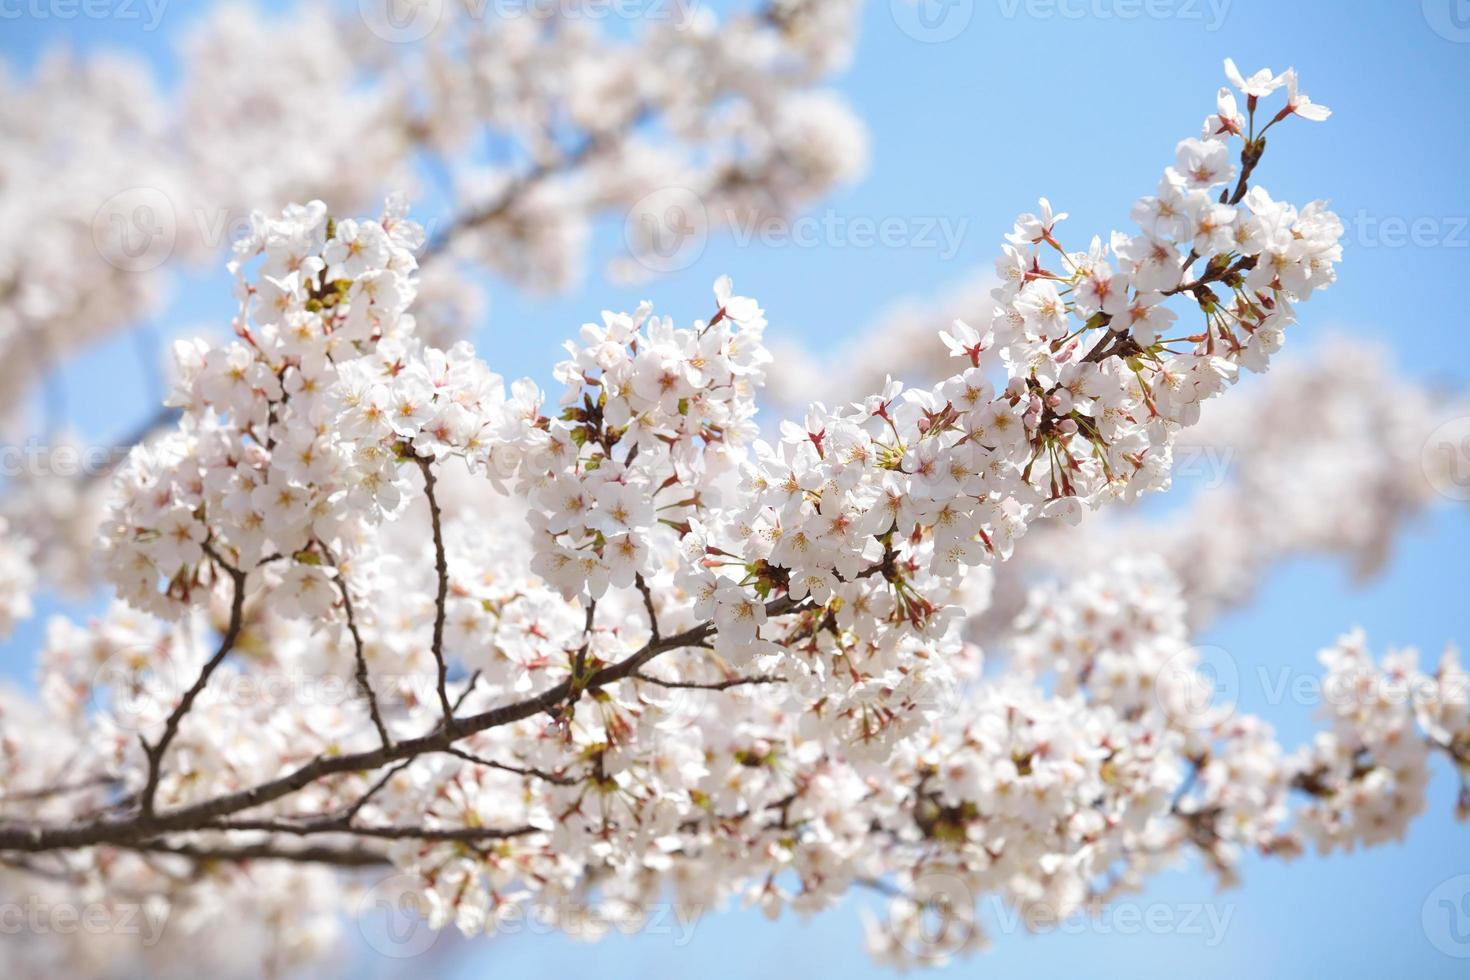 cherry blossom sakura in tokyo japan in sakura season 2014 photo